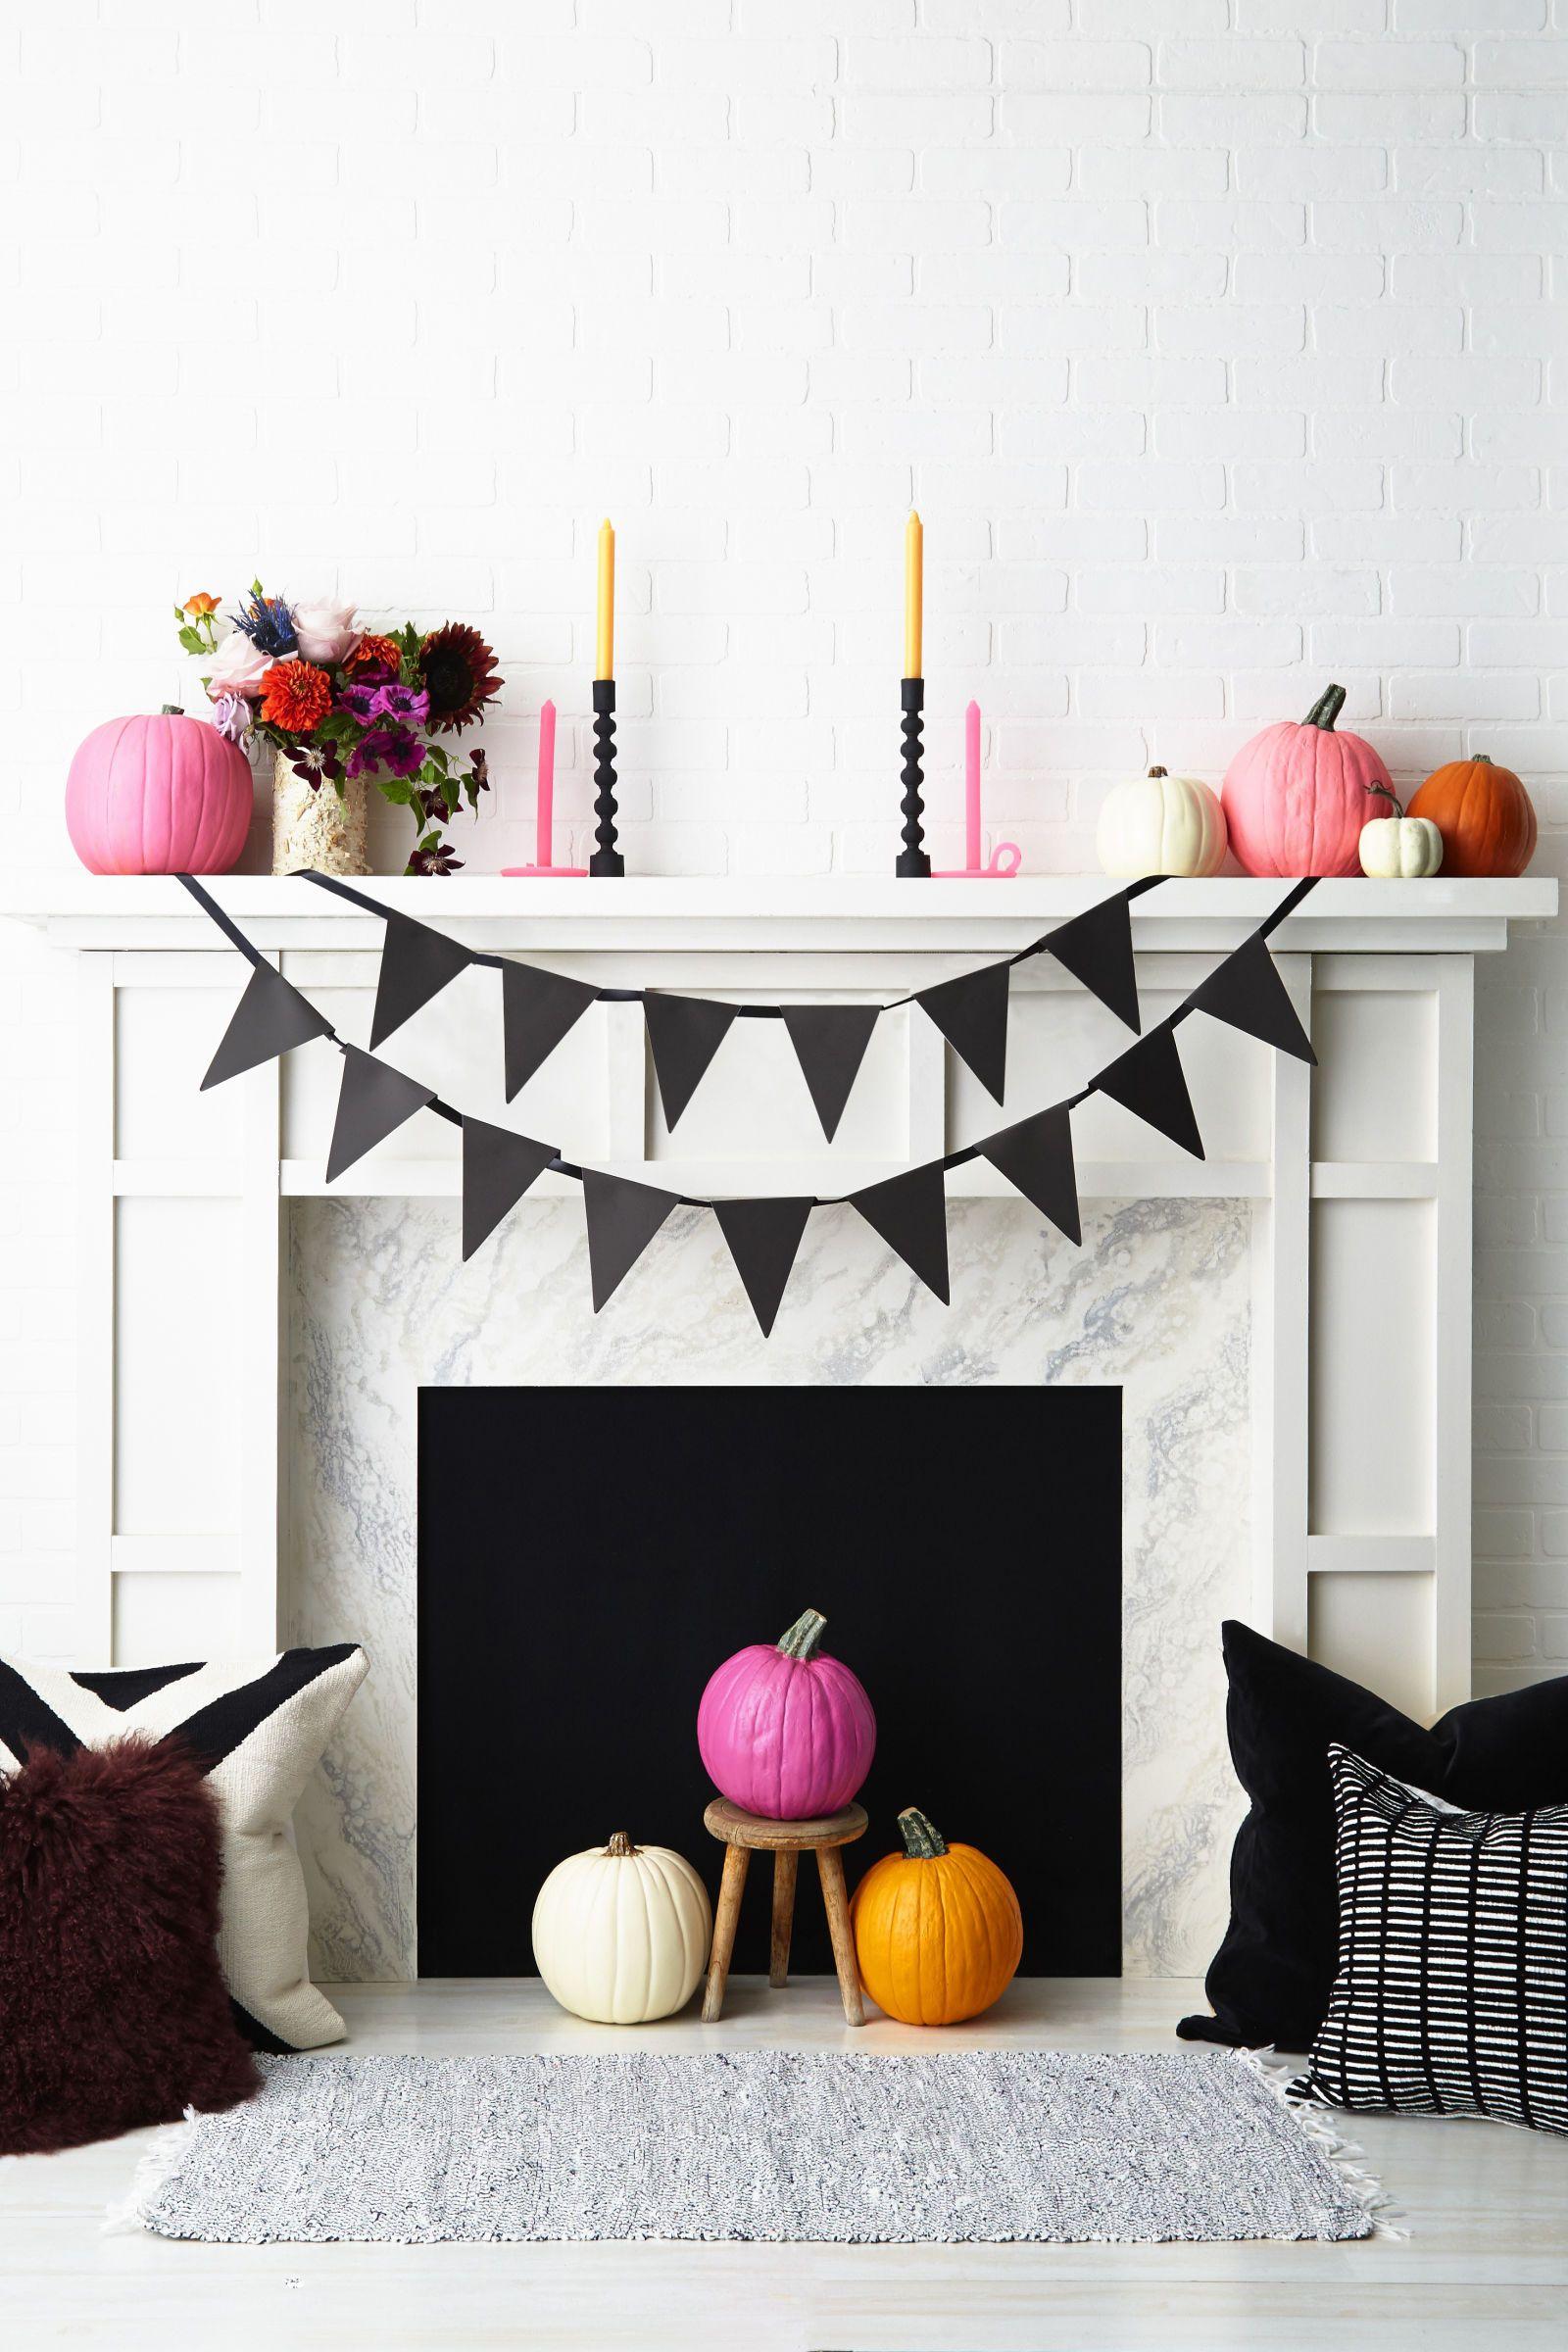 20+ DIY Halloween Decorations - Cool Homemade Halloween Decor Ideas